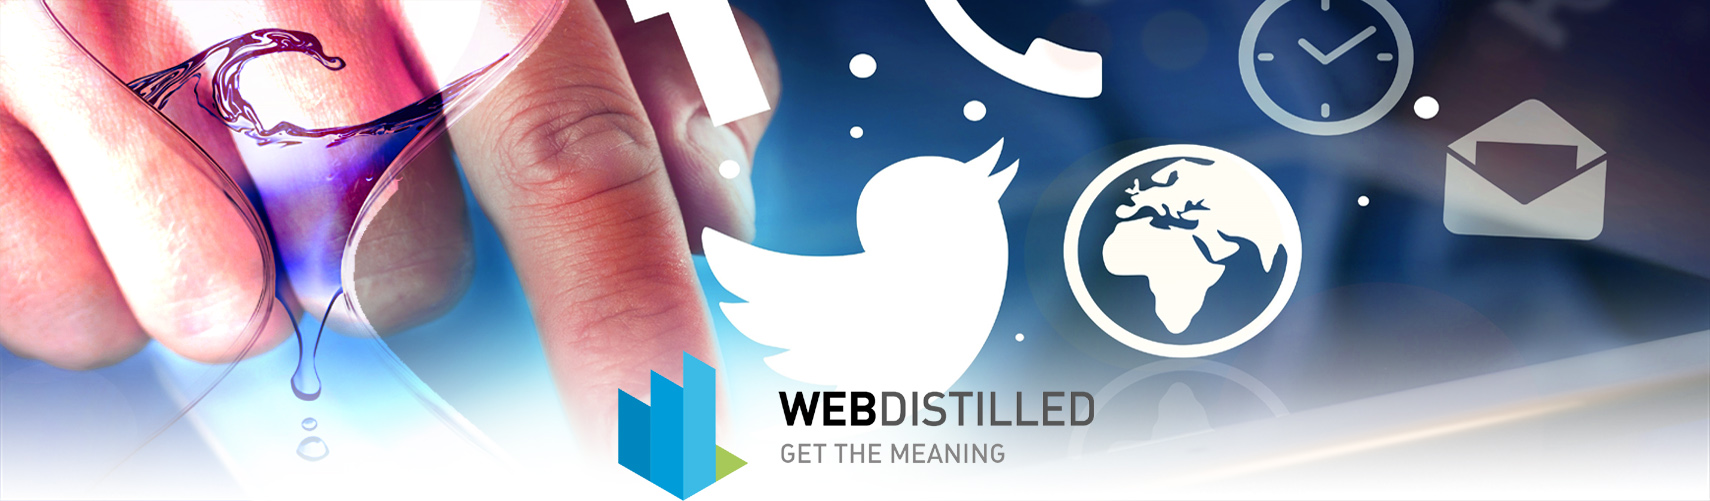 Newsjacking Webstilled